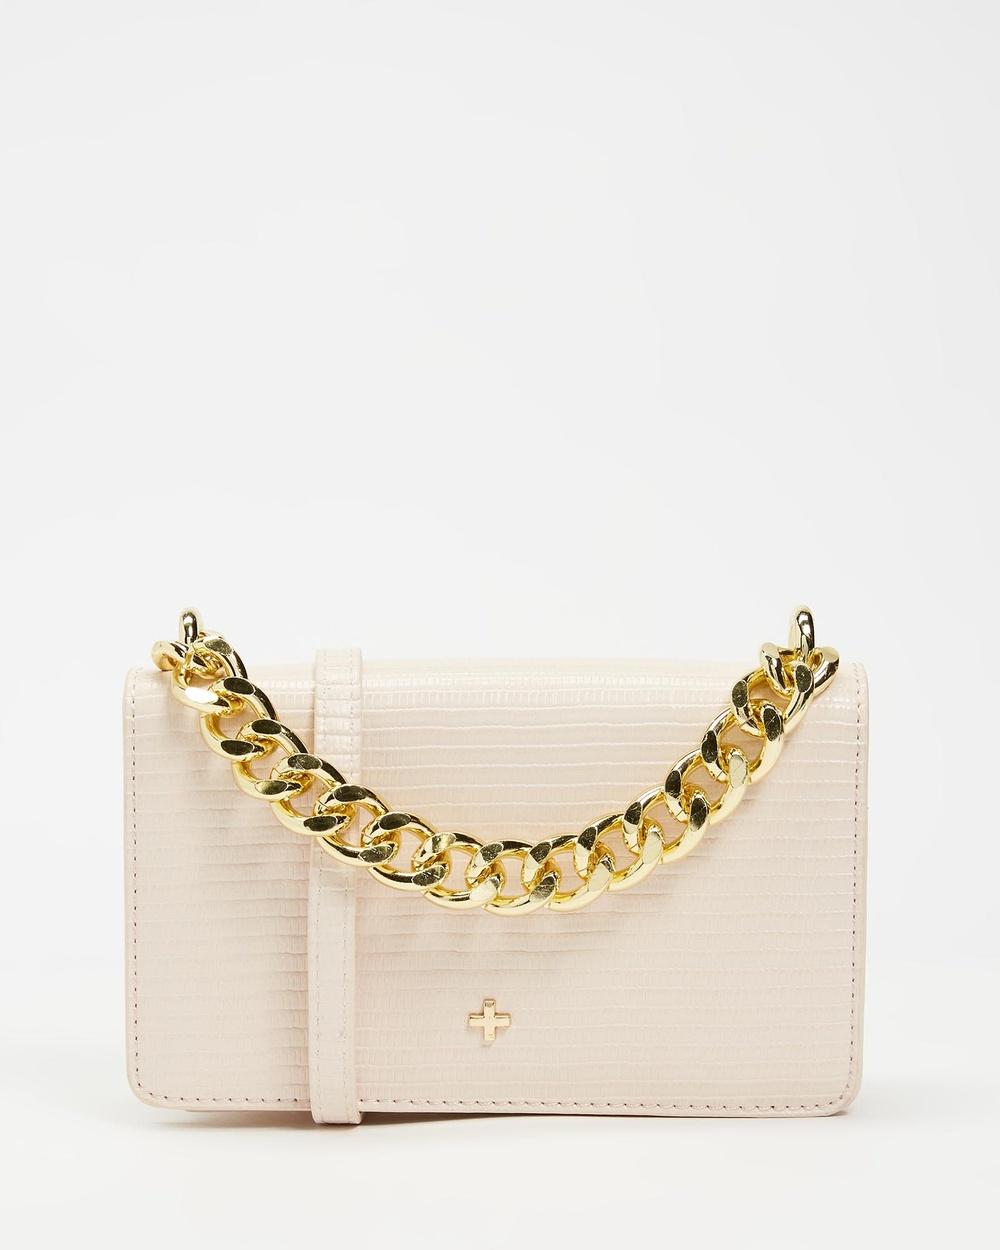 PETA AND JAIN Sloane Handbags Nude Lizard & Gold